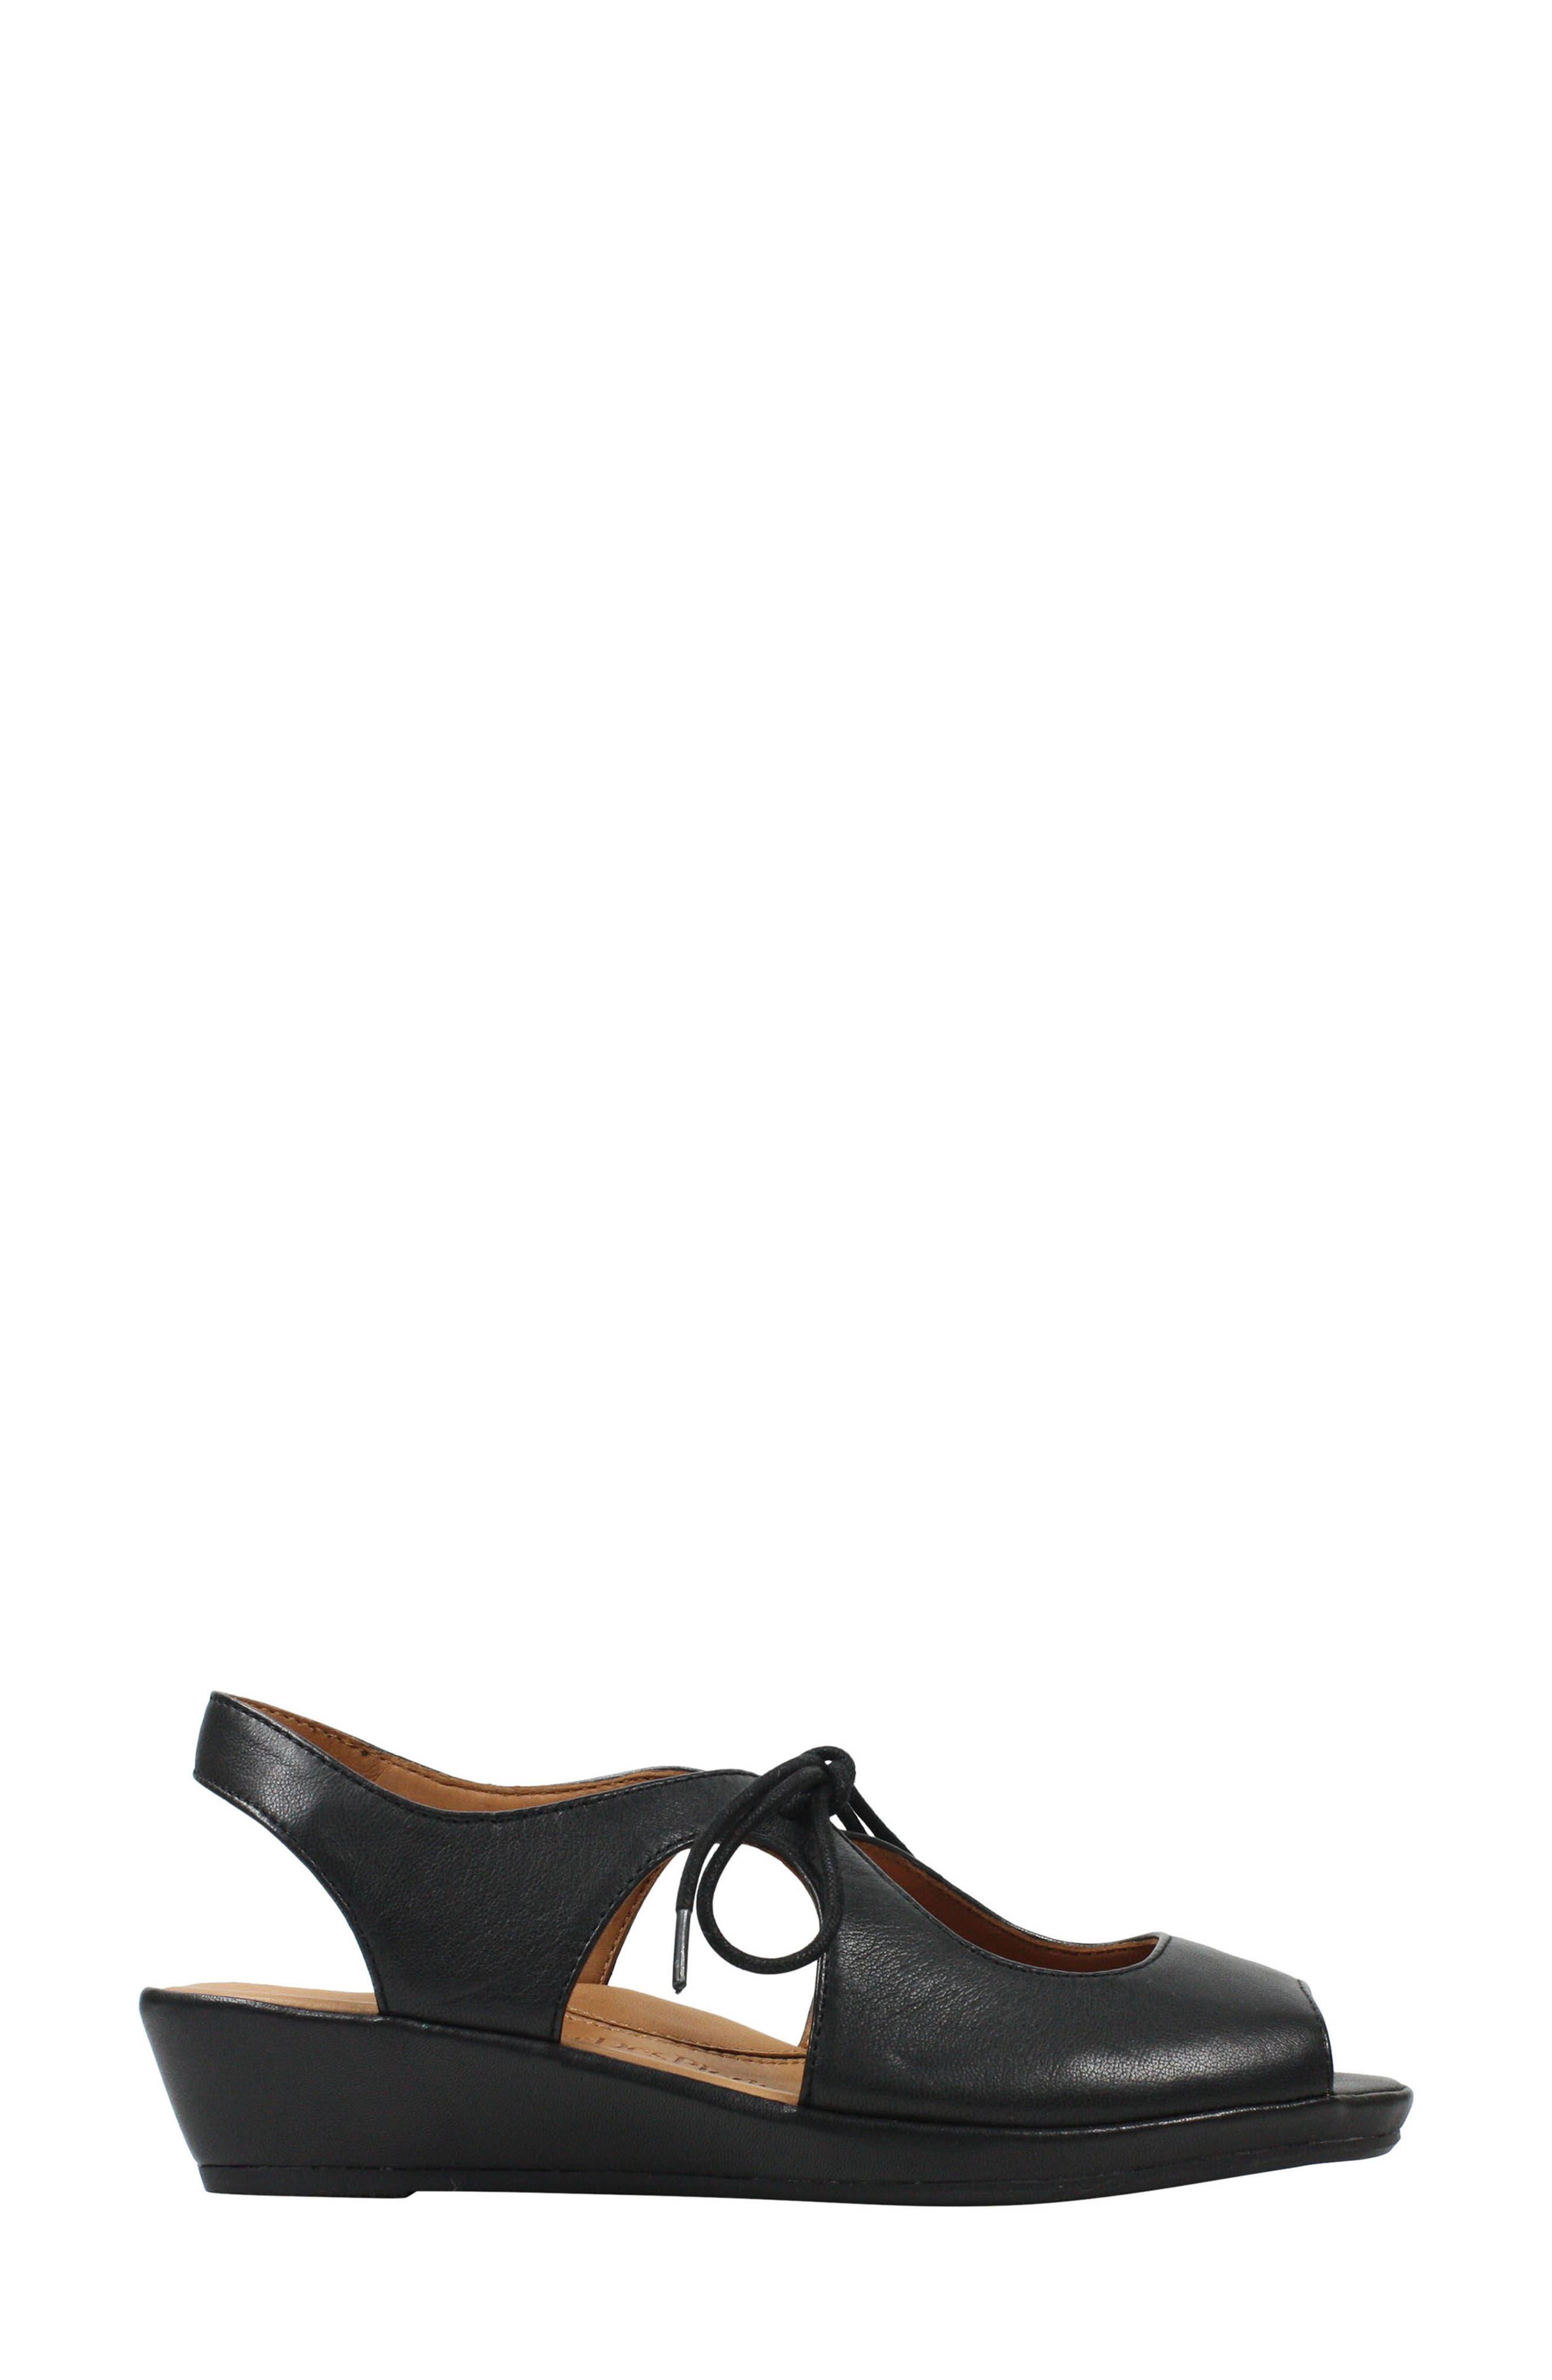 Brettany Sandal,                             Alternate thumbnail 4, color,                             Black Leather